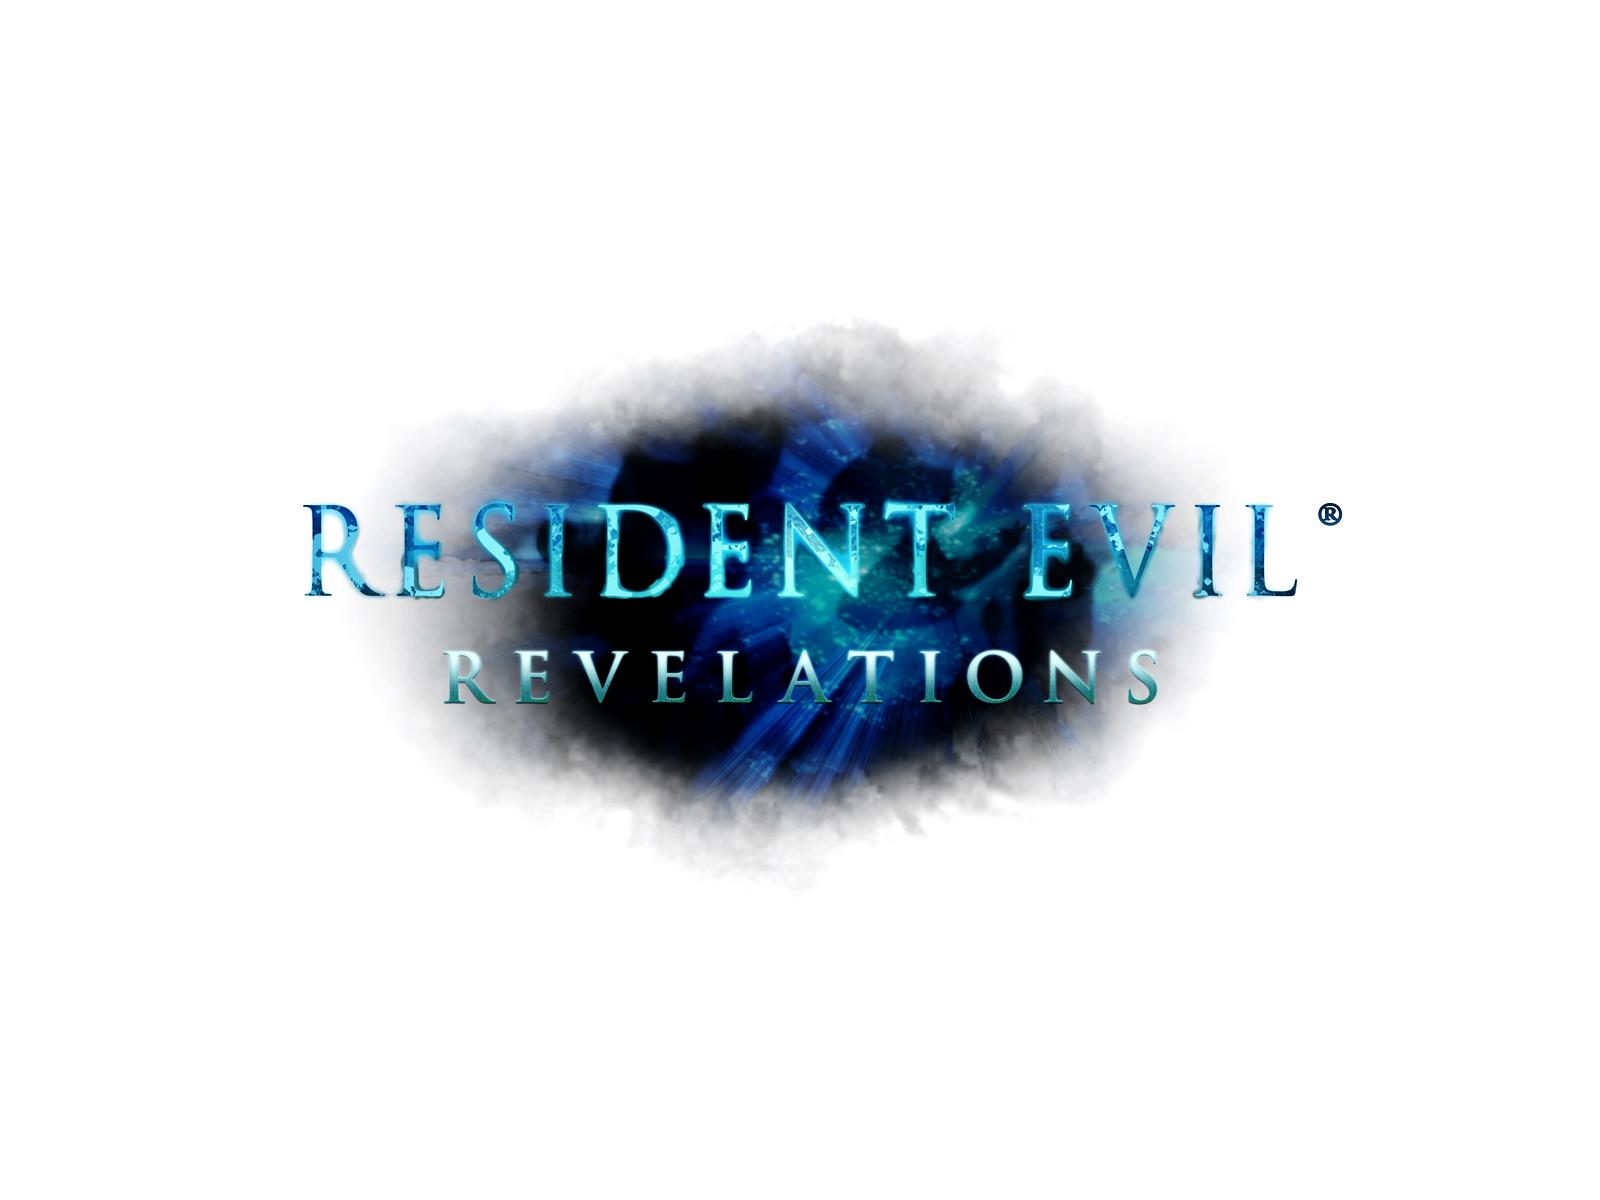 http://3.bp.blogspot.com/-DhLbtbLi0sw/Twn17n5hqhI/AAAAAAAAARU/pWyJ1BH9WyM/s1600/Resident_Evil_Revelations_Title_Logo_White_HD_Wallpaper-Vvallpaper.Net.jpg